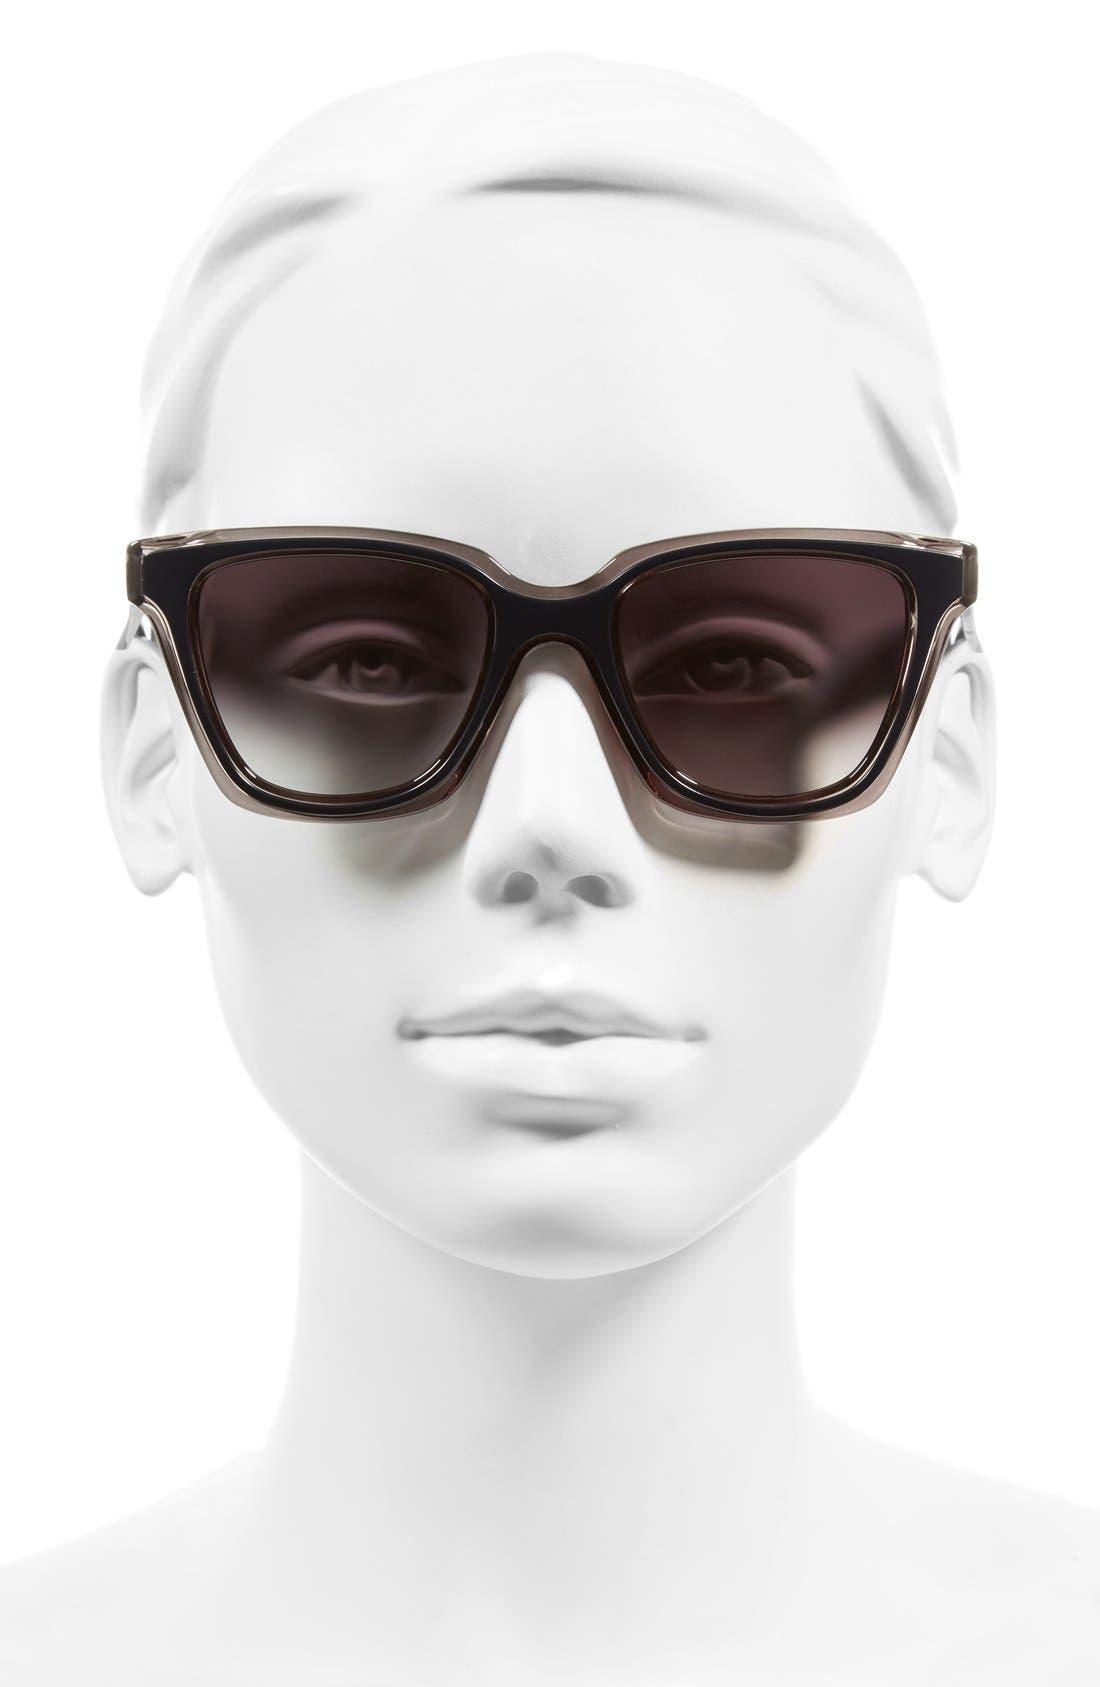 Be You 50mm Gradient Sunglasses,                             Alternate thumbnail 4, color,                             020